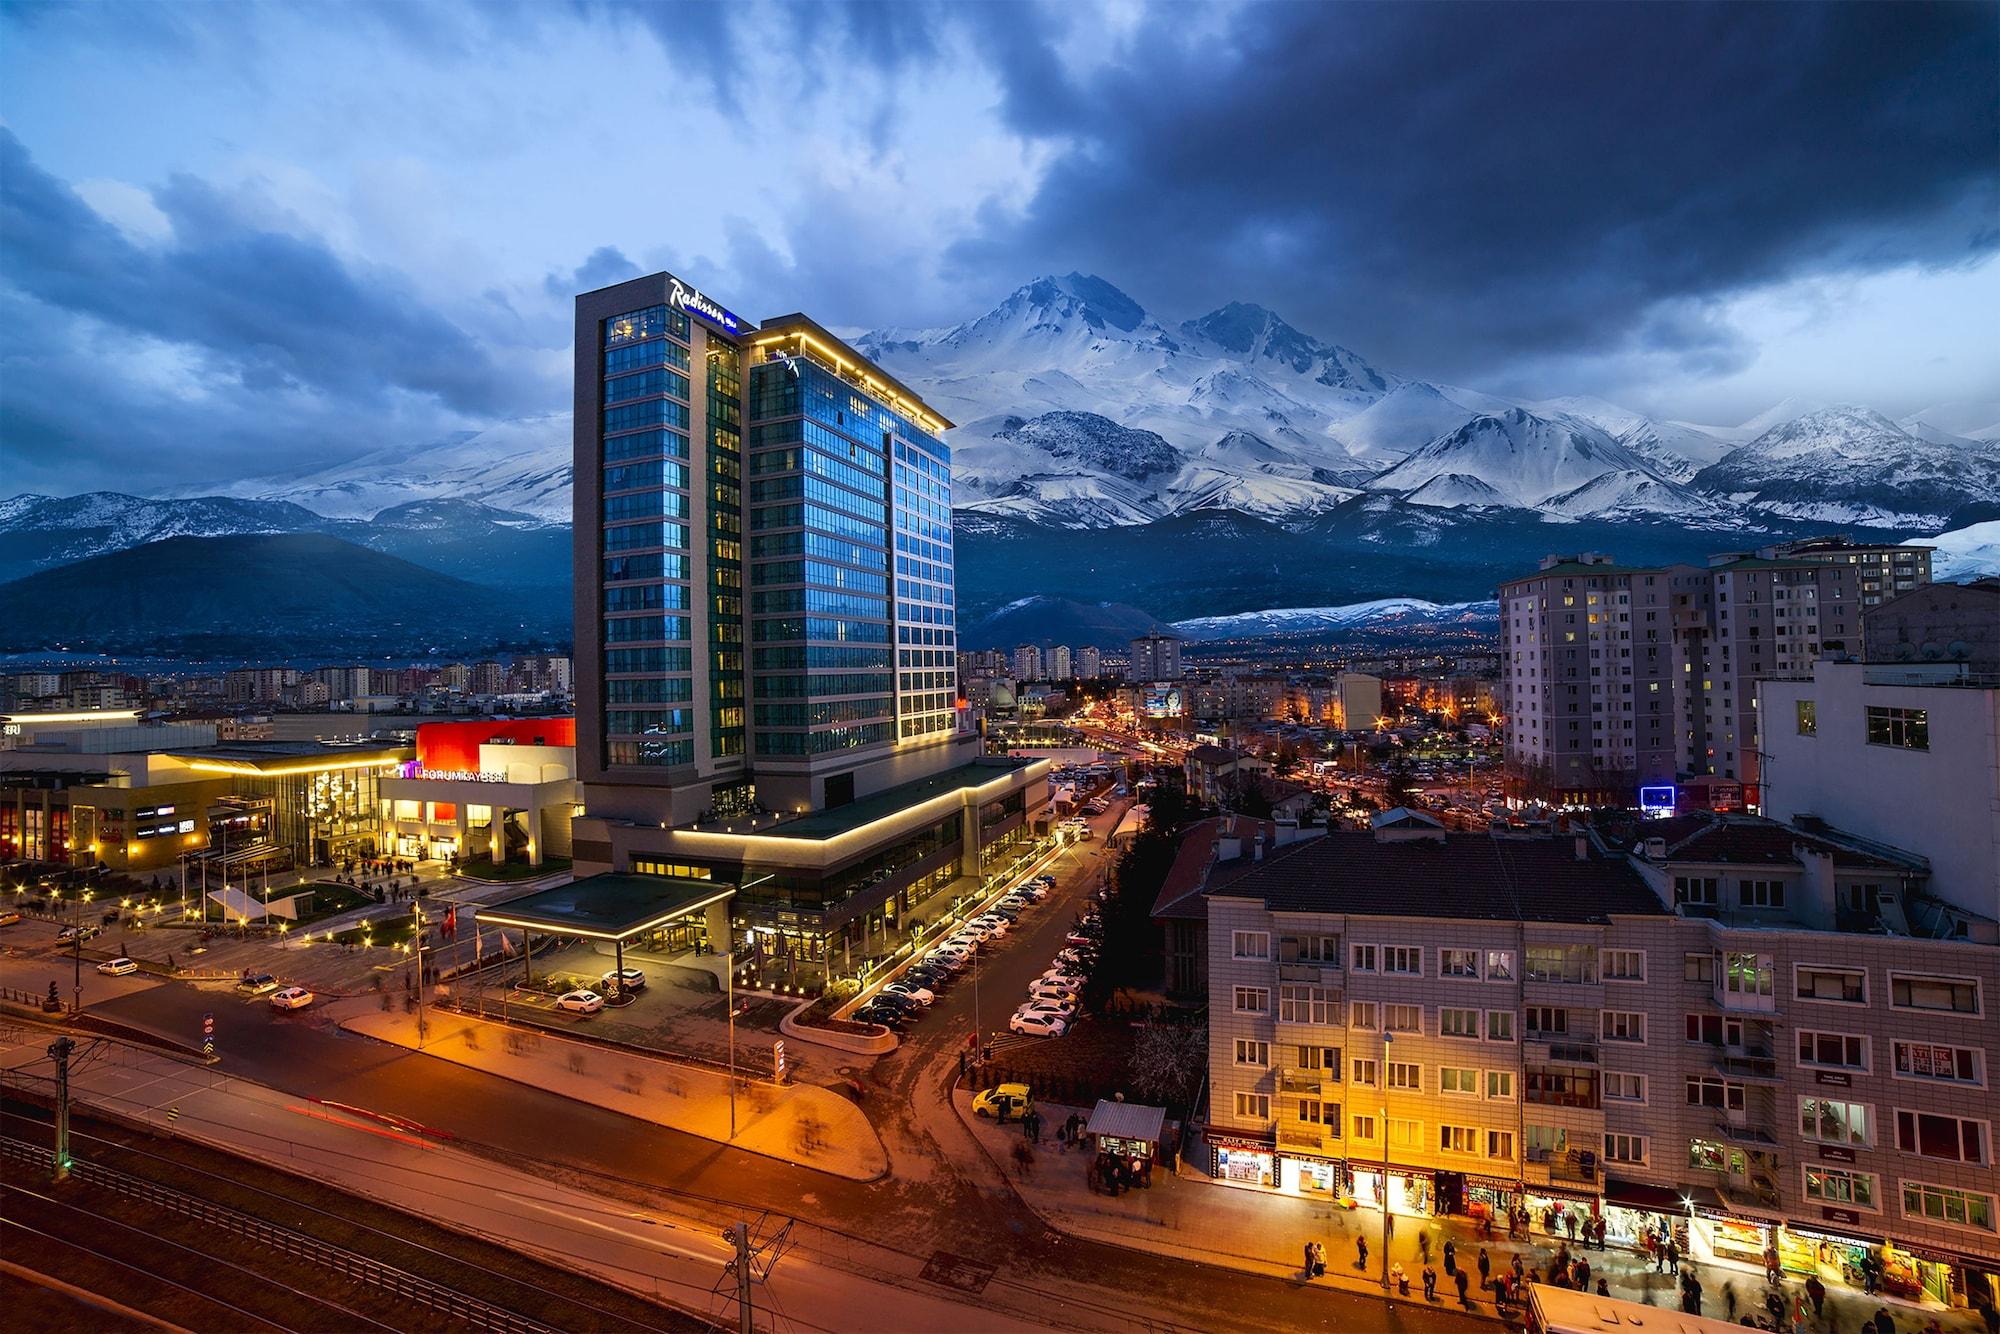 Radisson Blu Hotel, Kayseri, Melikgazi